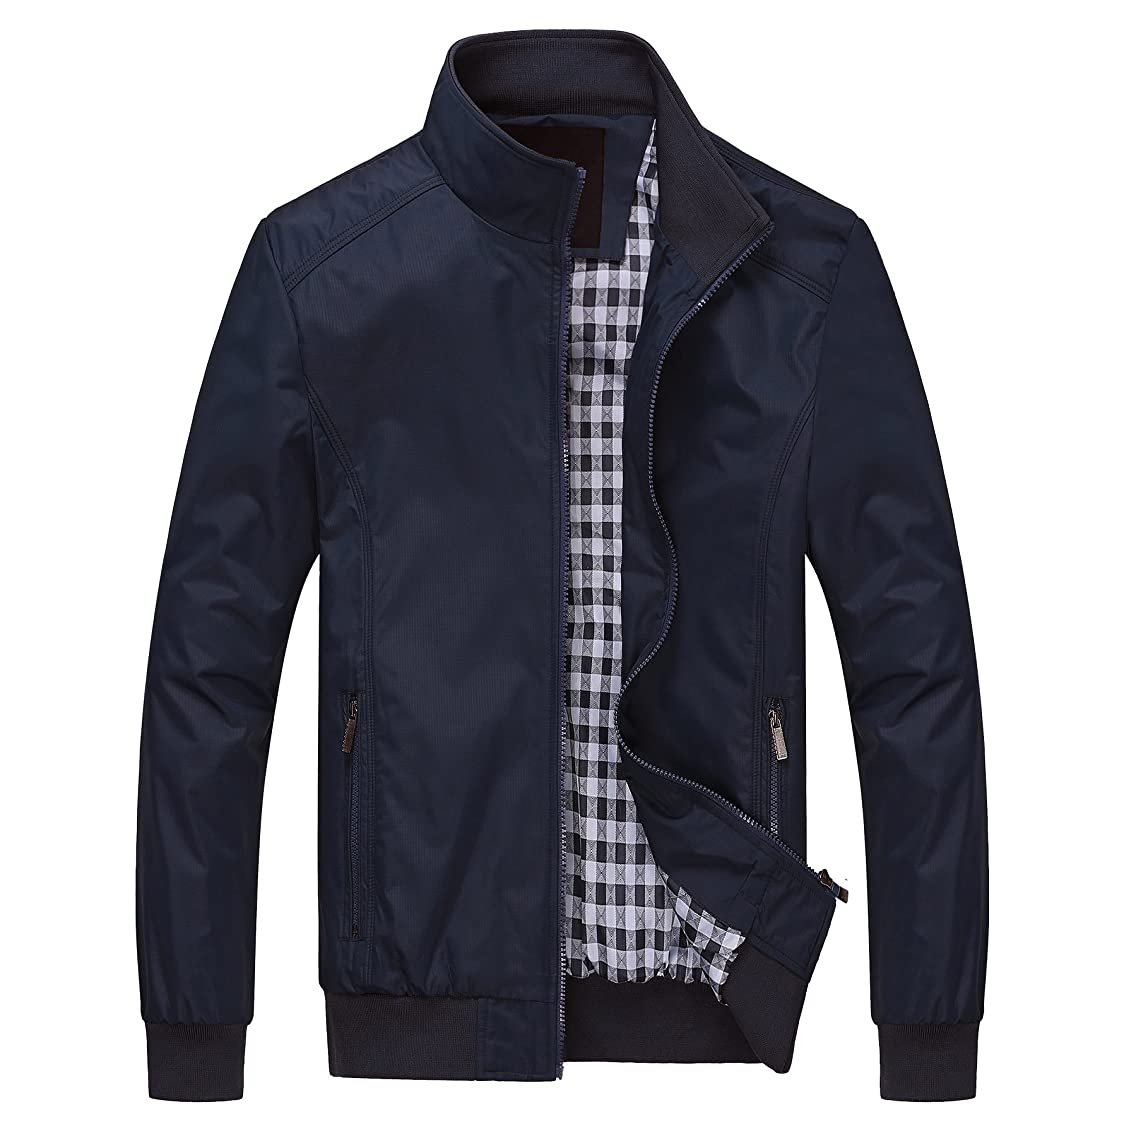 ROMINTON Kolongvangie Mens Casual Jacket Outdoor Windbreaker Outerwear Jackets and Coats Slim Fit